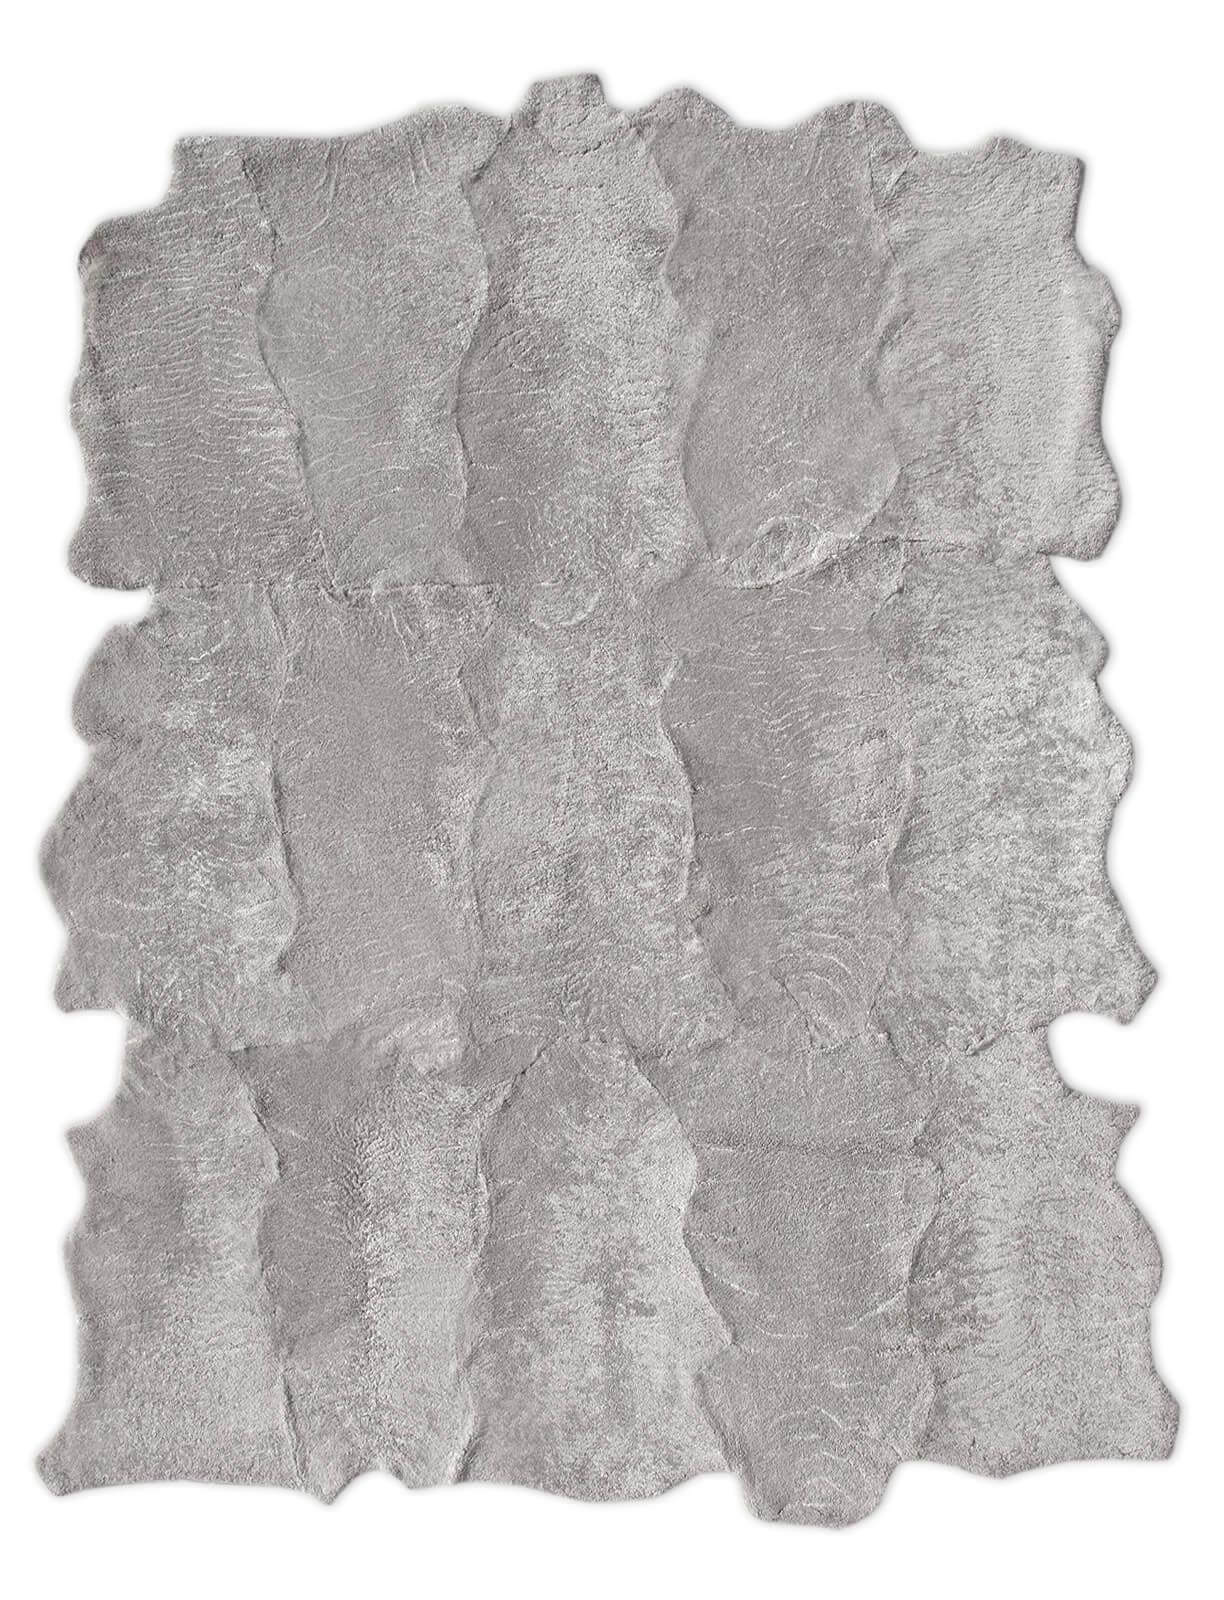 CHESTERFIELD ORGANIC  shown in Snowy Grey